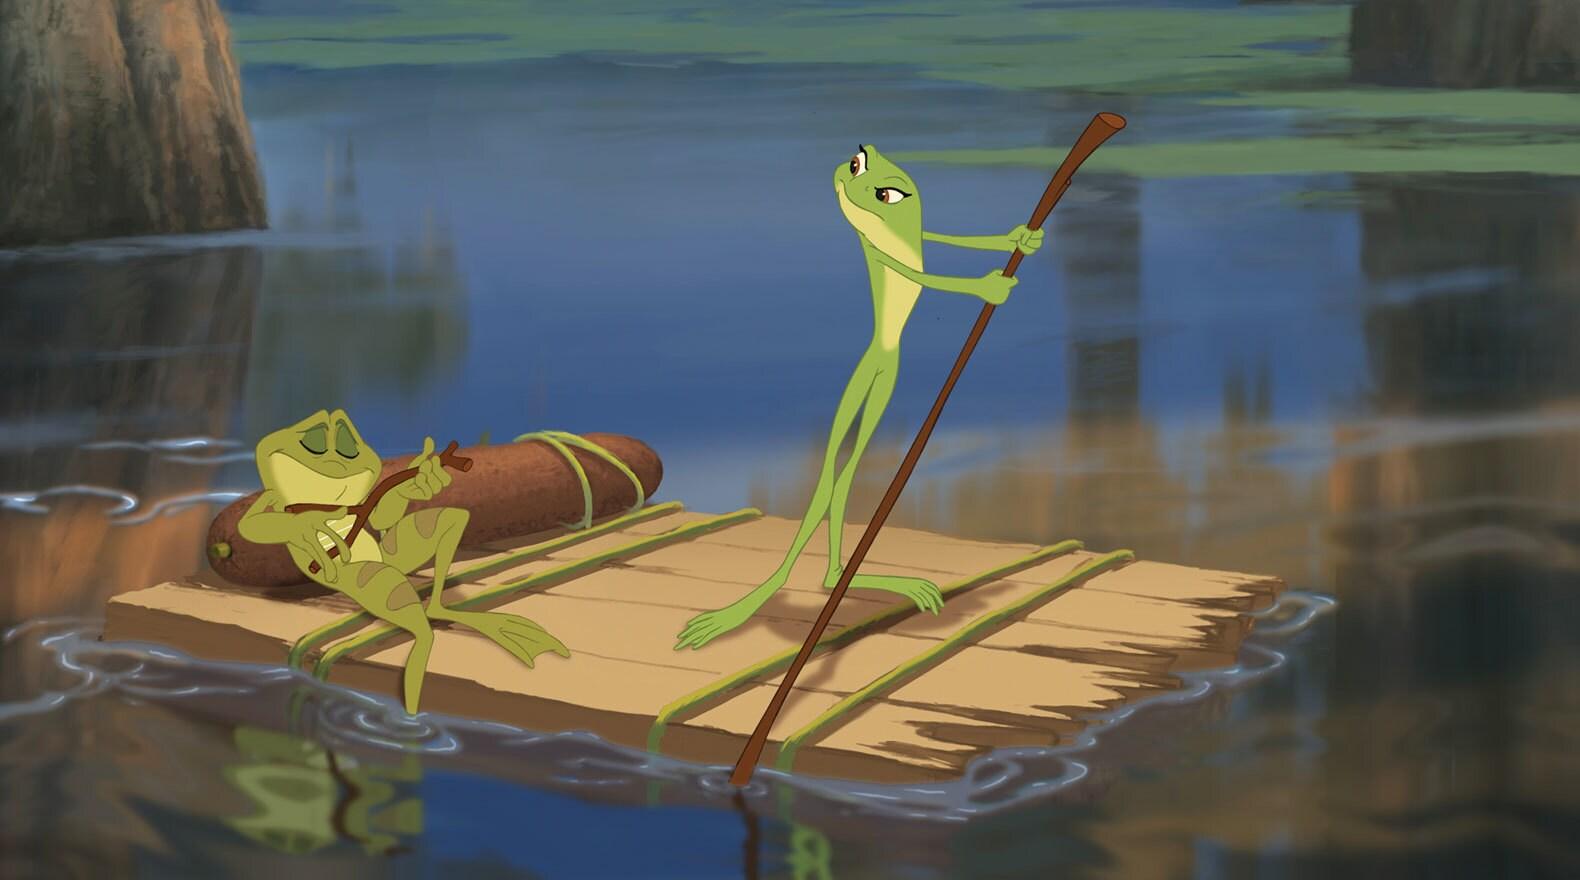 Frog Naveen lounging and Frog Tiana rowing a makeshift raft